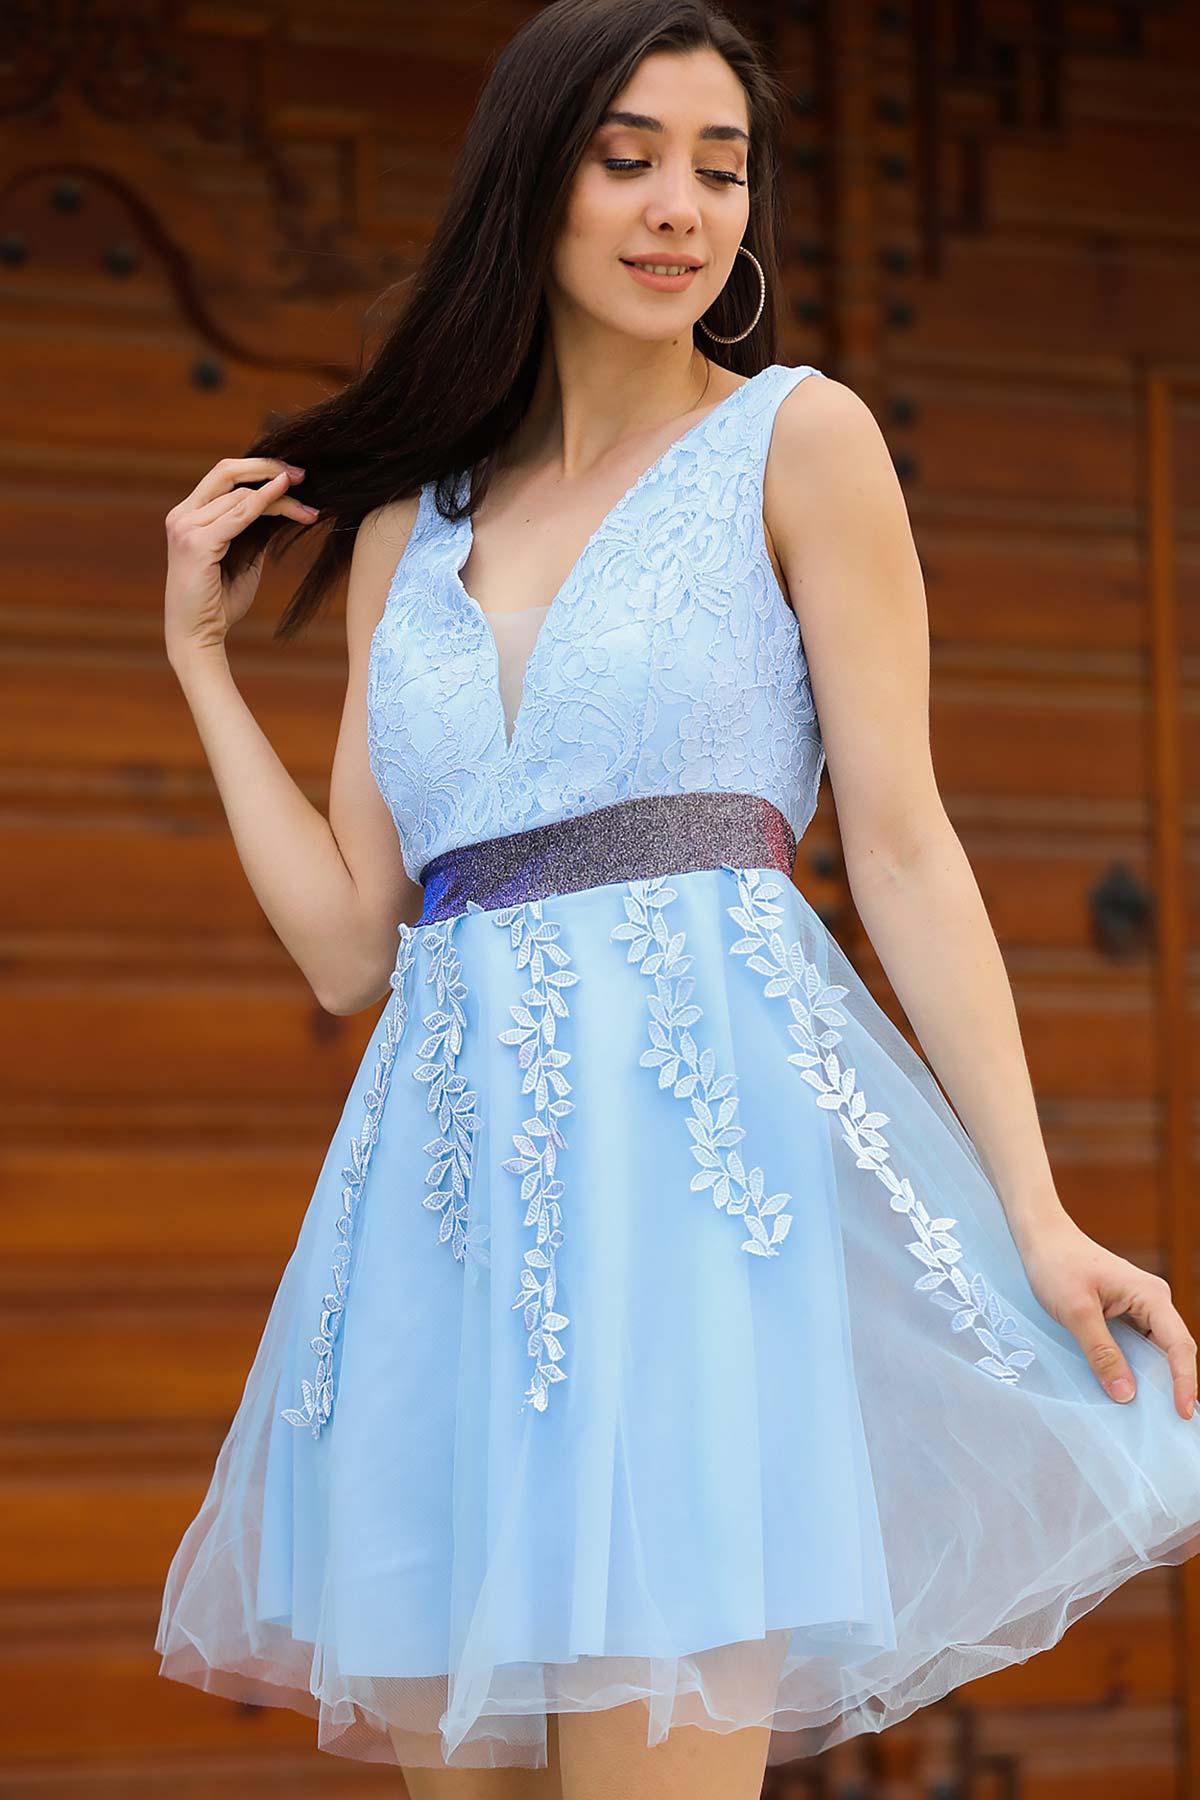 Women's Lace Detail Baby Blue Short Evening Dress